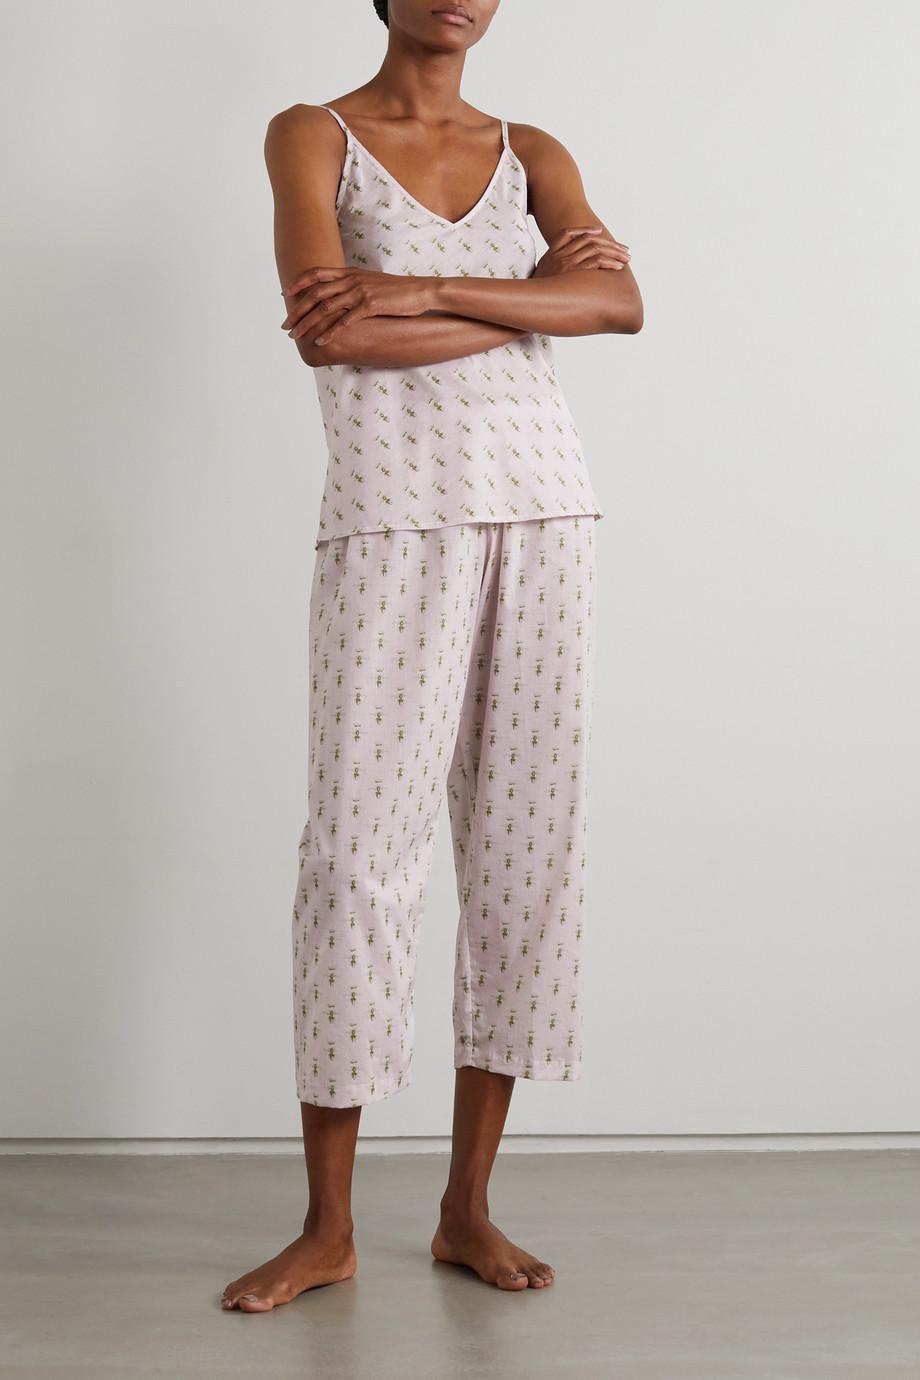 Pour Les Femmes Queen Bee Pyjama aus bedrucktem Baumwoll-Voile